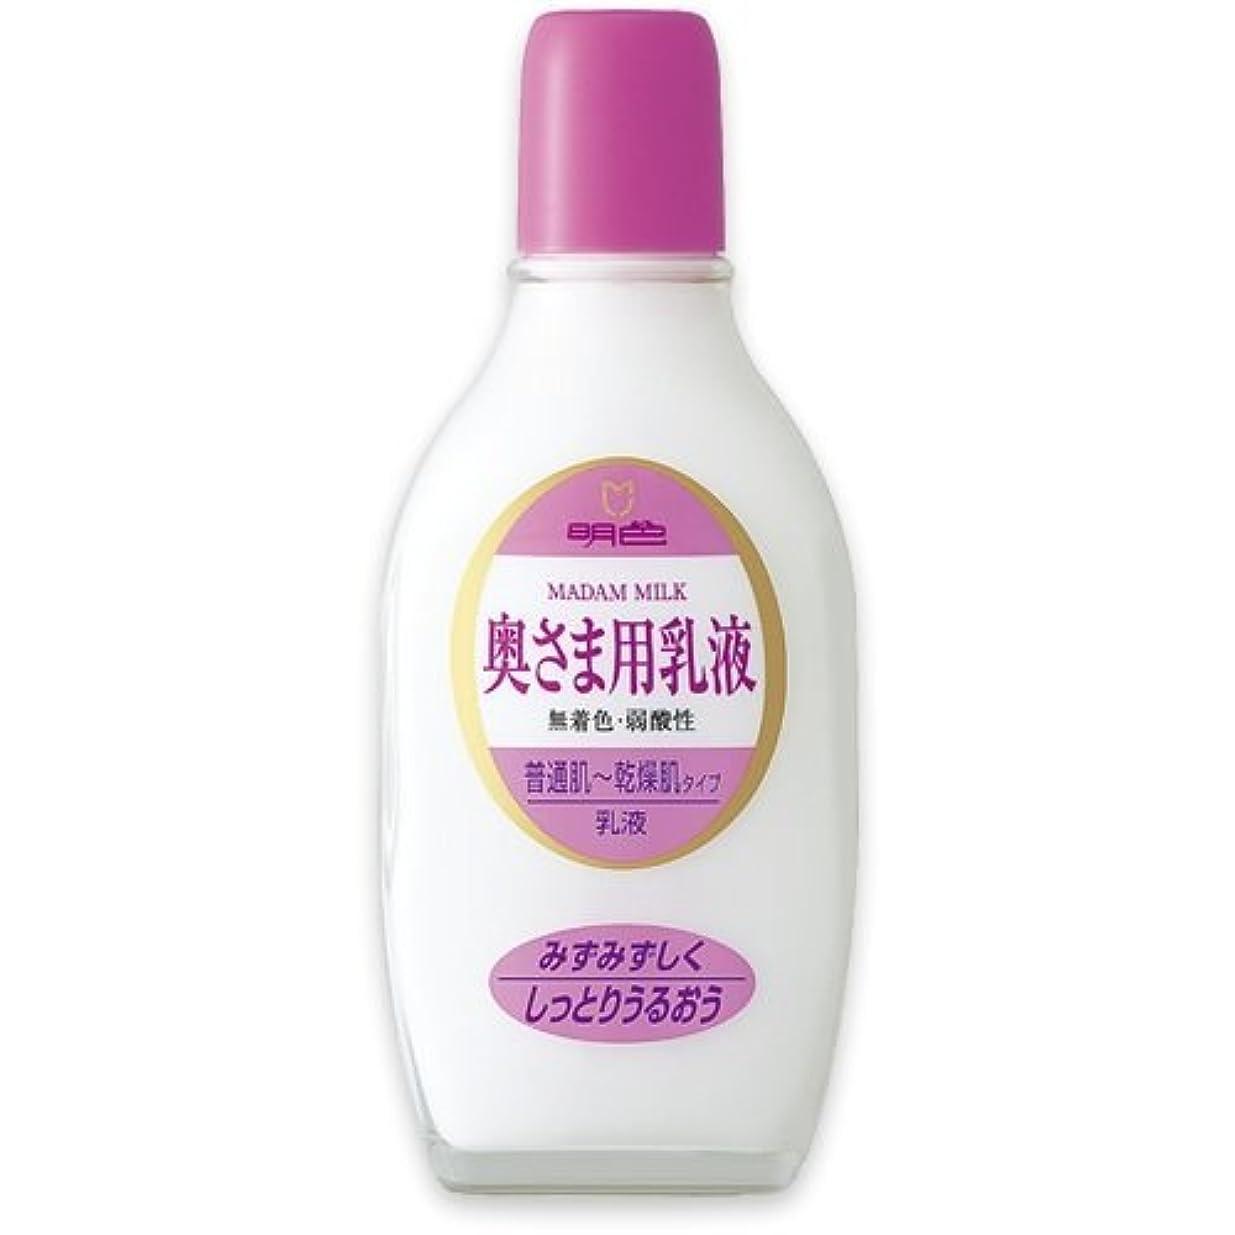 行為シェル処分した明色 奥さま用乳液 普通肌~乾燥肌用乳液 Madam Milk MEISHOKU